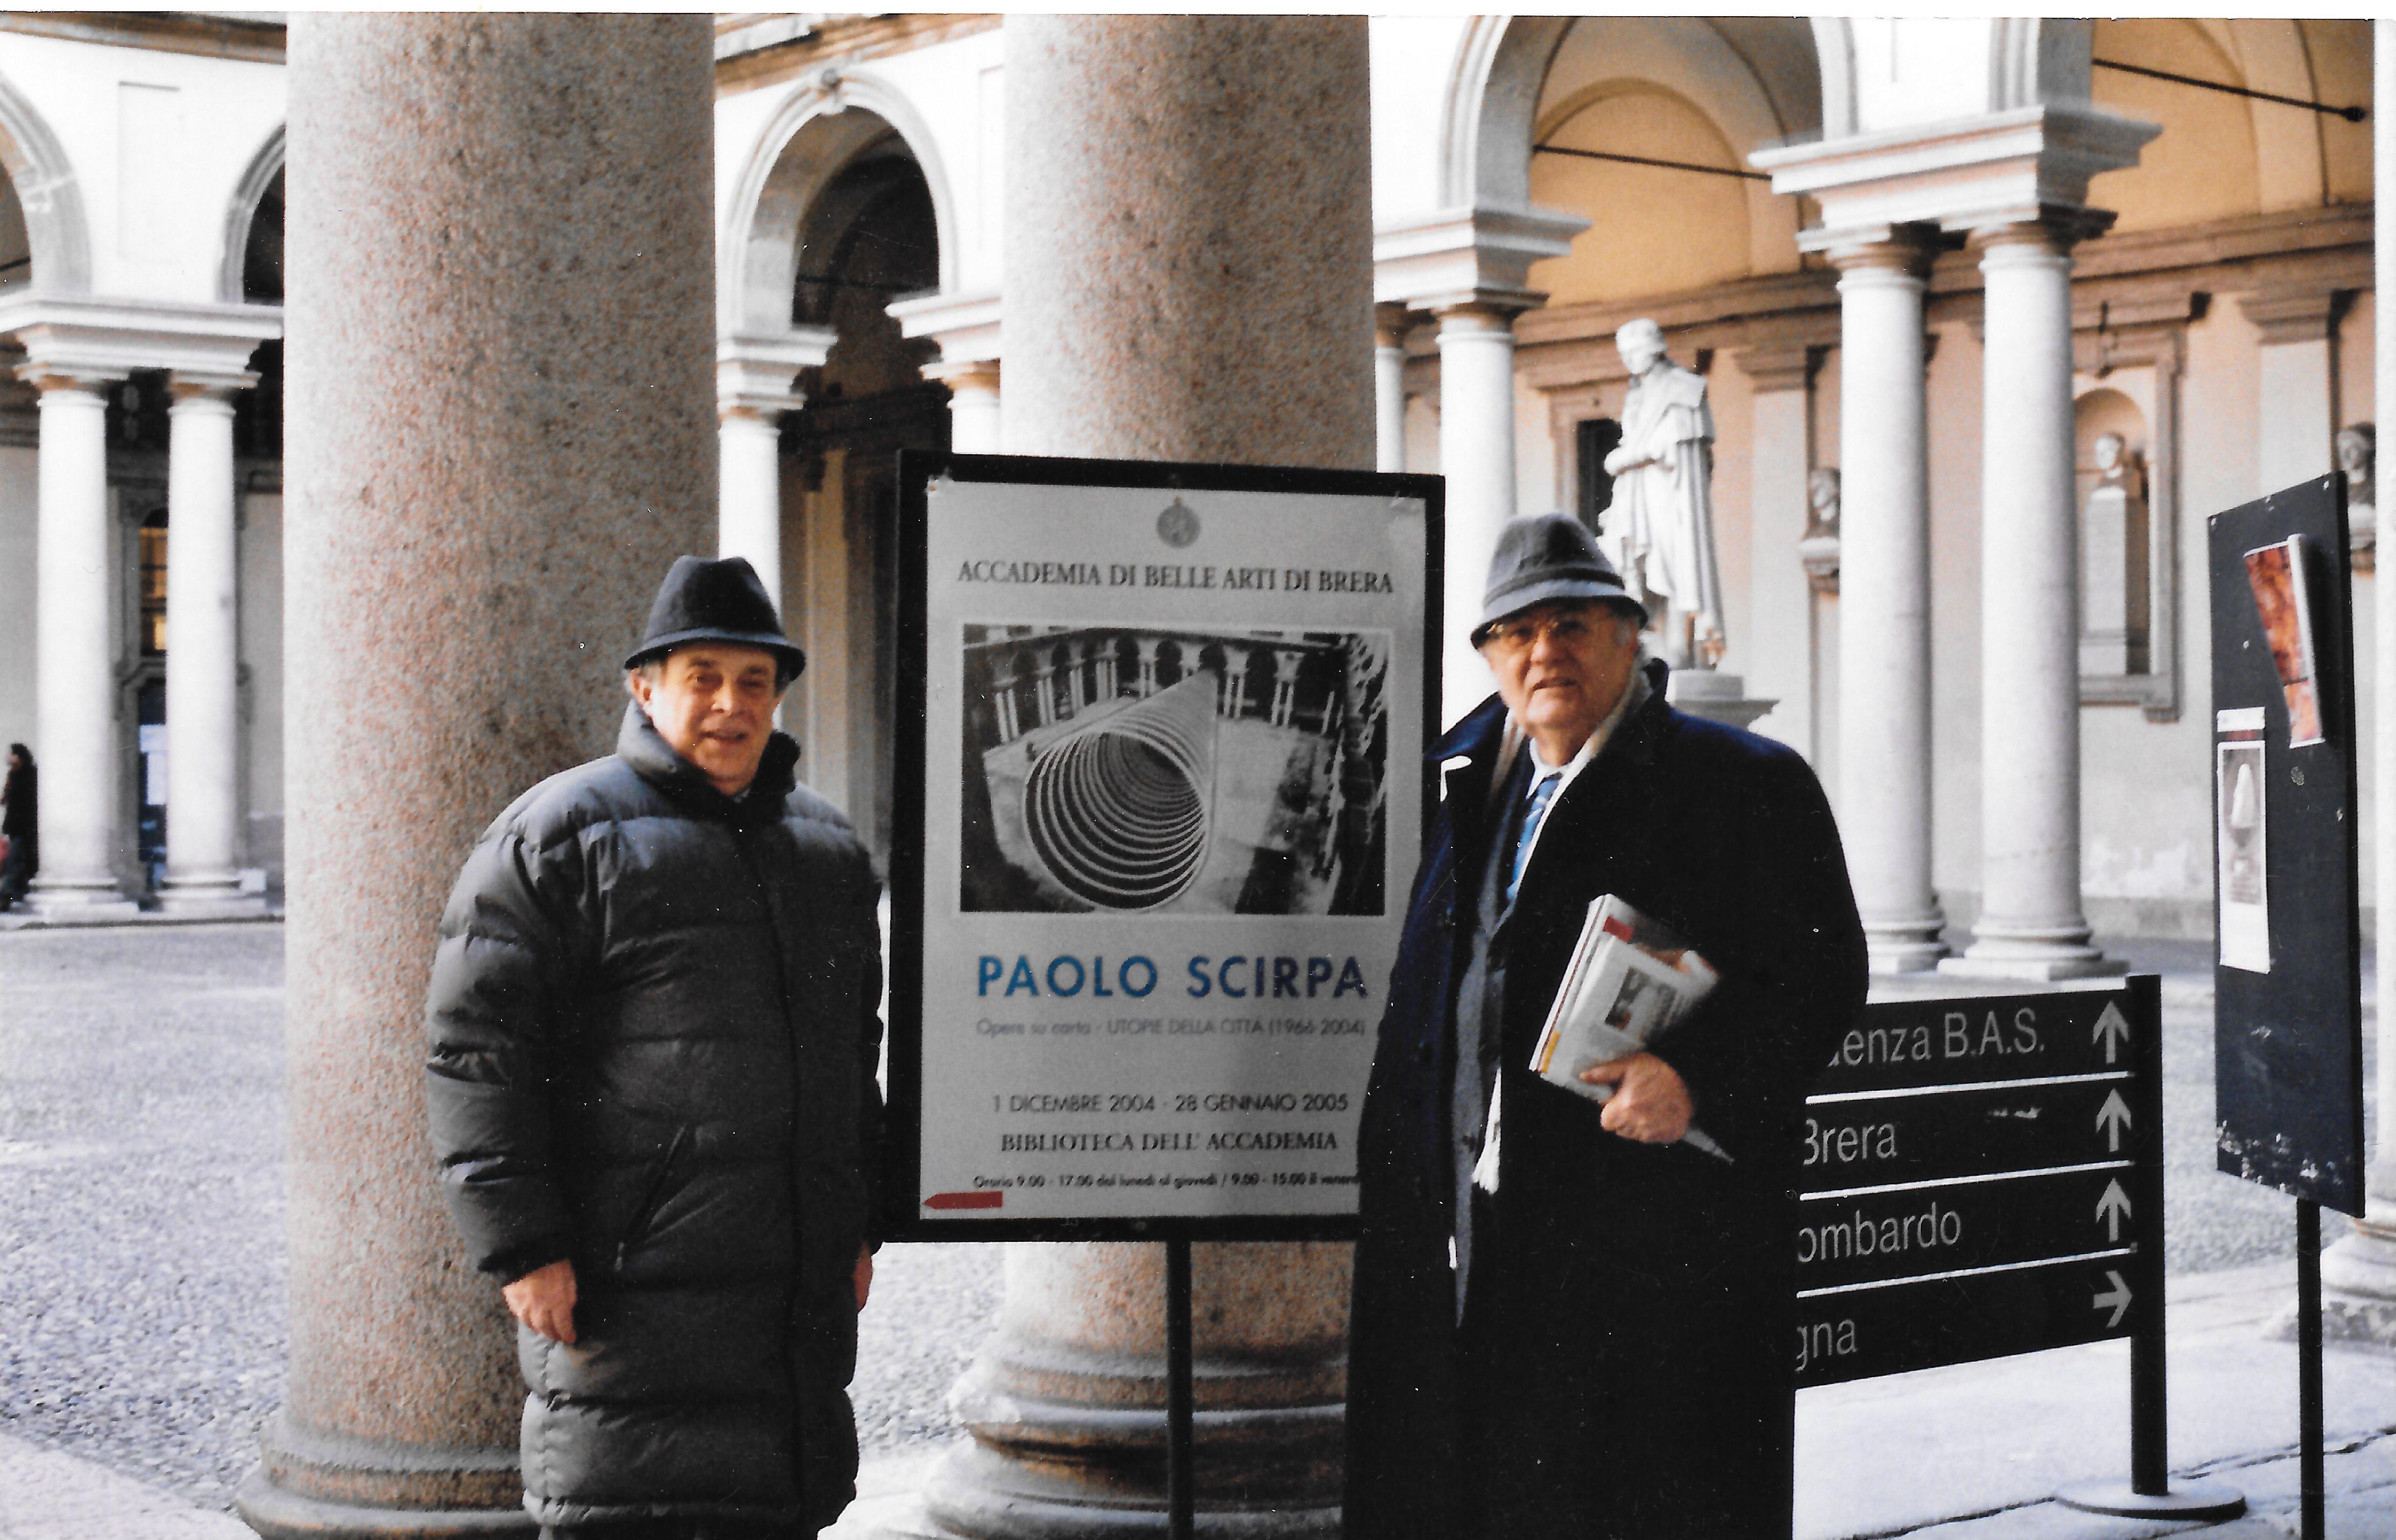 Paolo Scirpa e Giuseppe Zecchillo_Cortile Accademia Brera, 2005